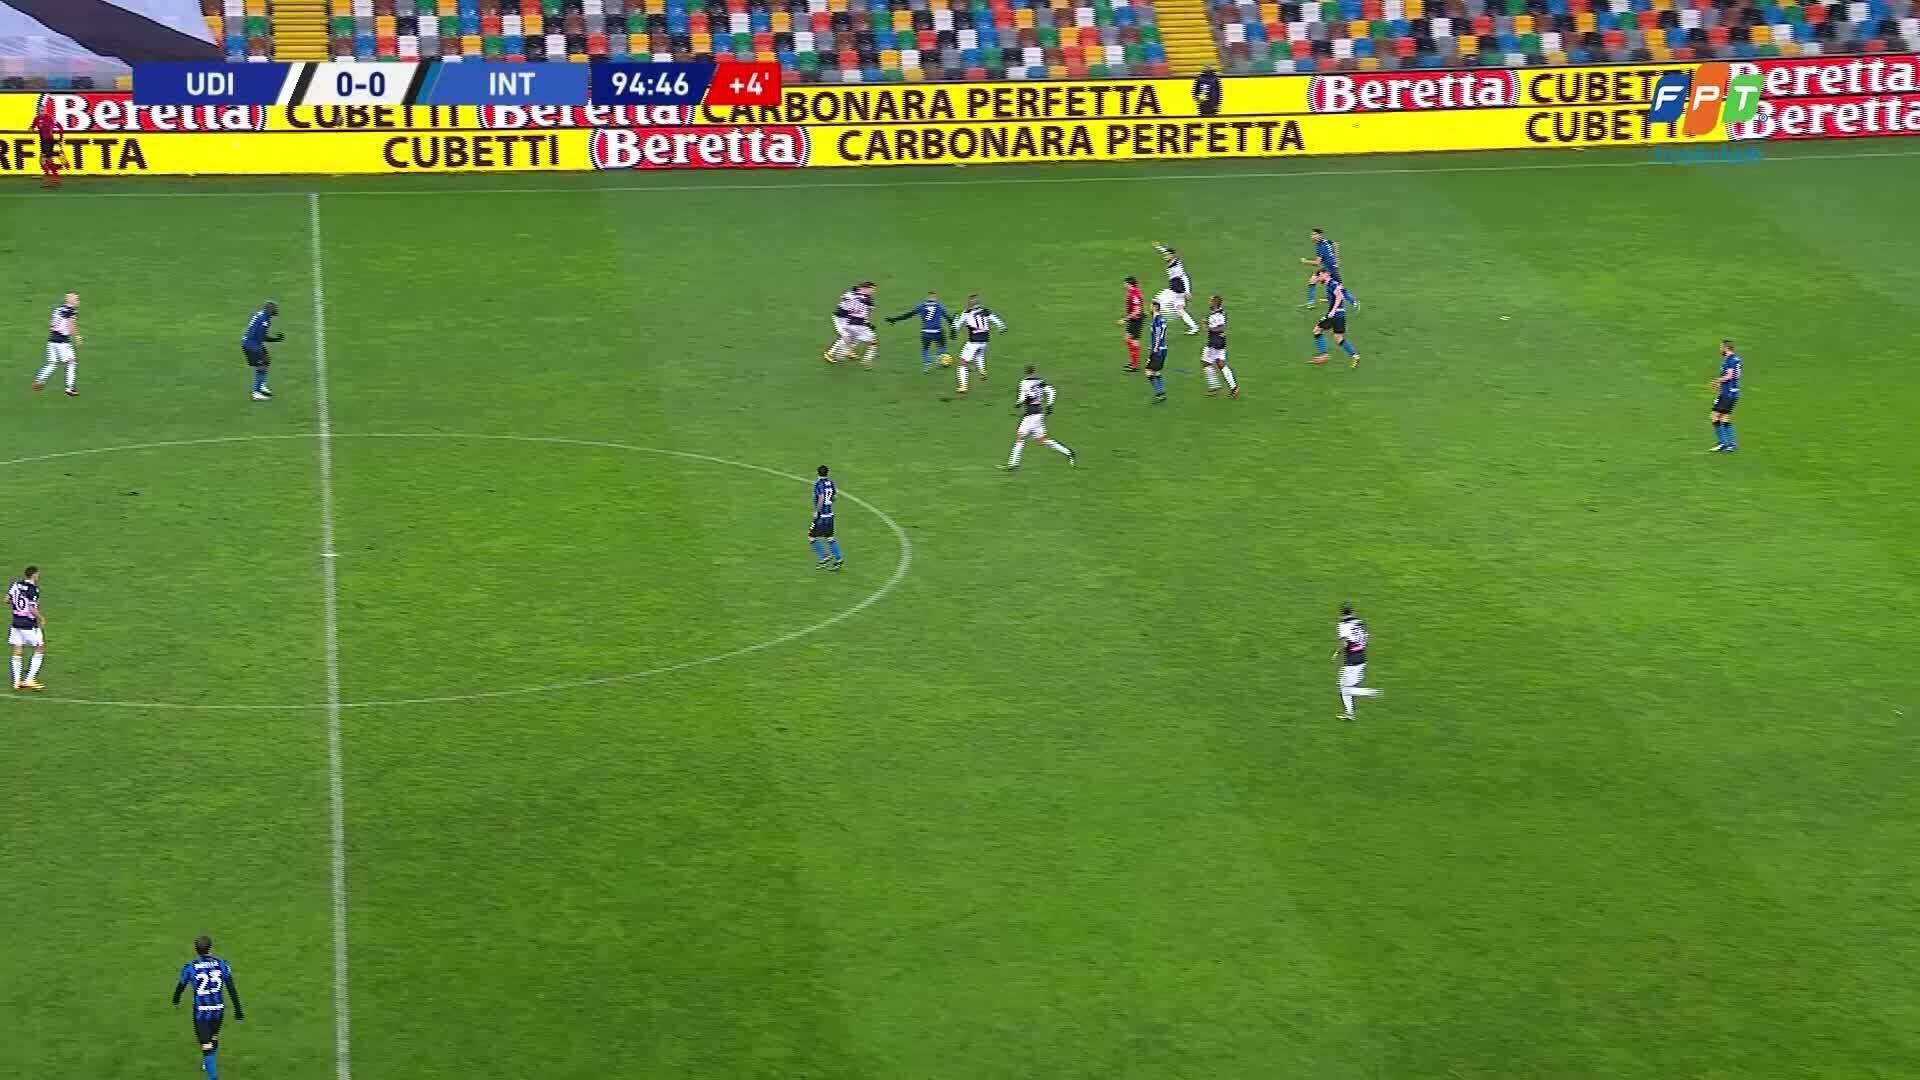 Udinese 0-0 Inter